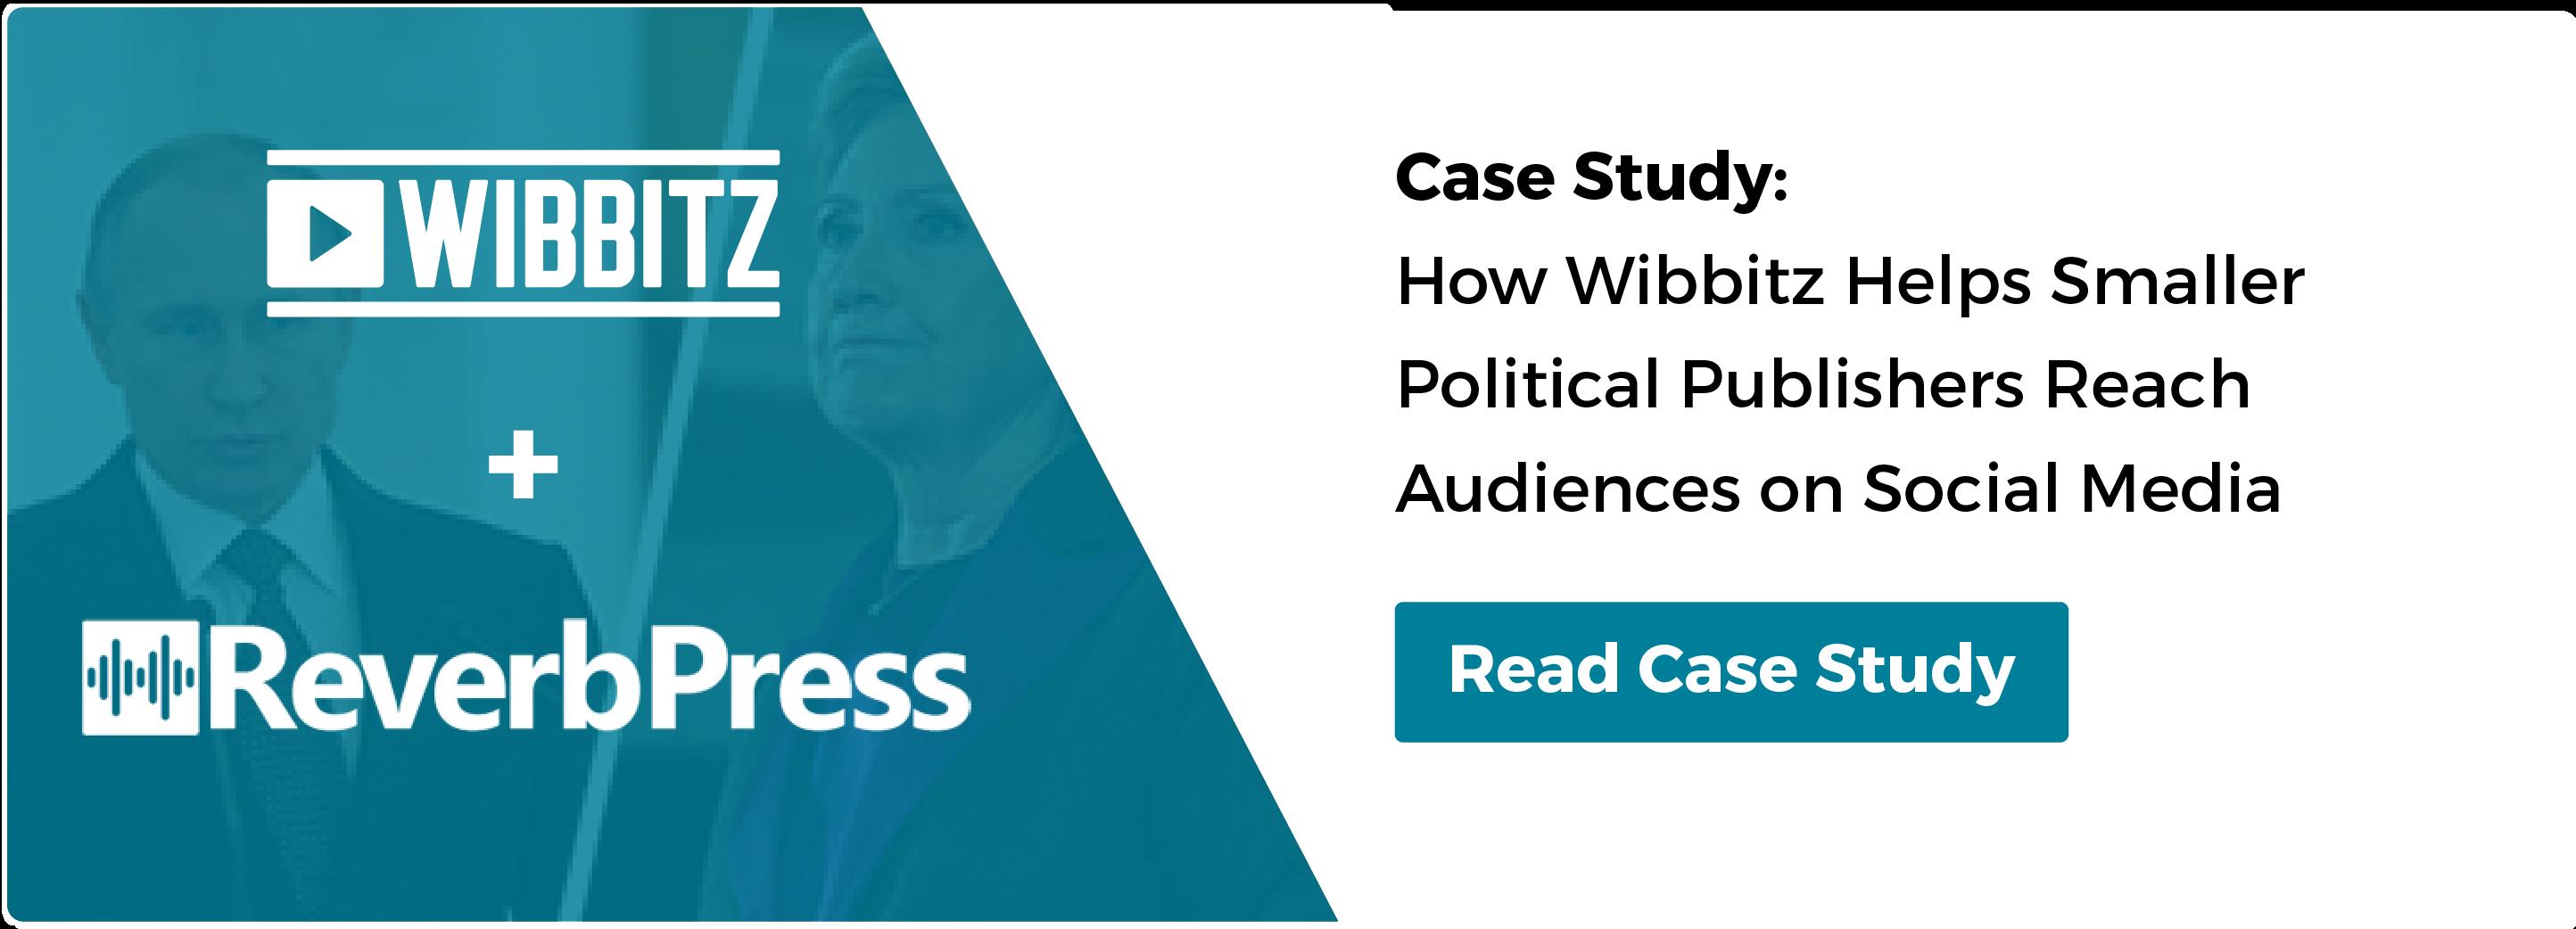 REVERB PRESS CASE STUDY: Political Publishers Reach Audiences on Social Media